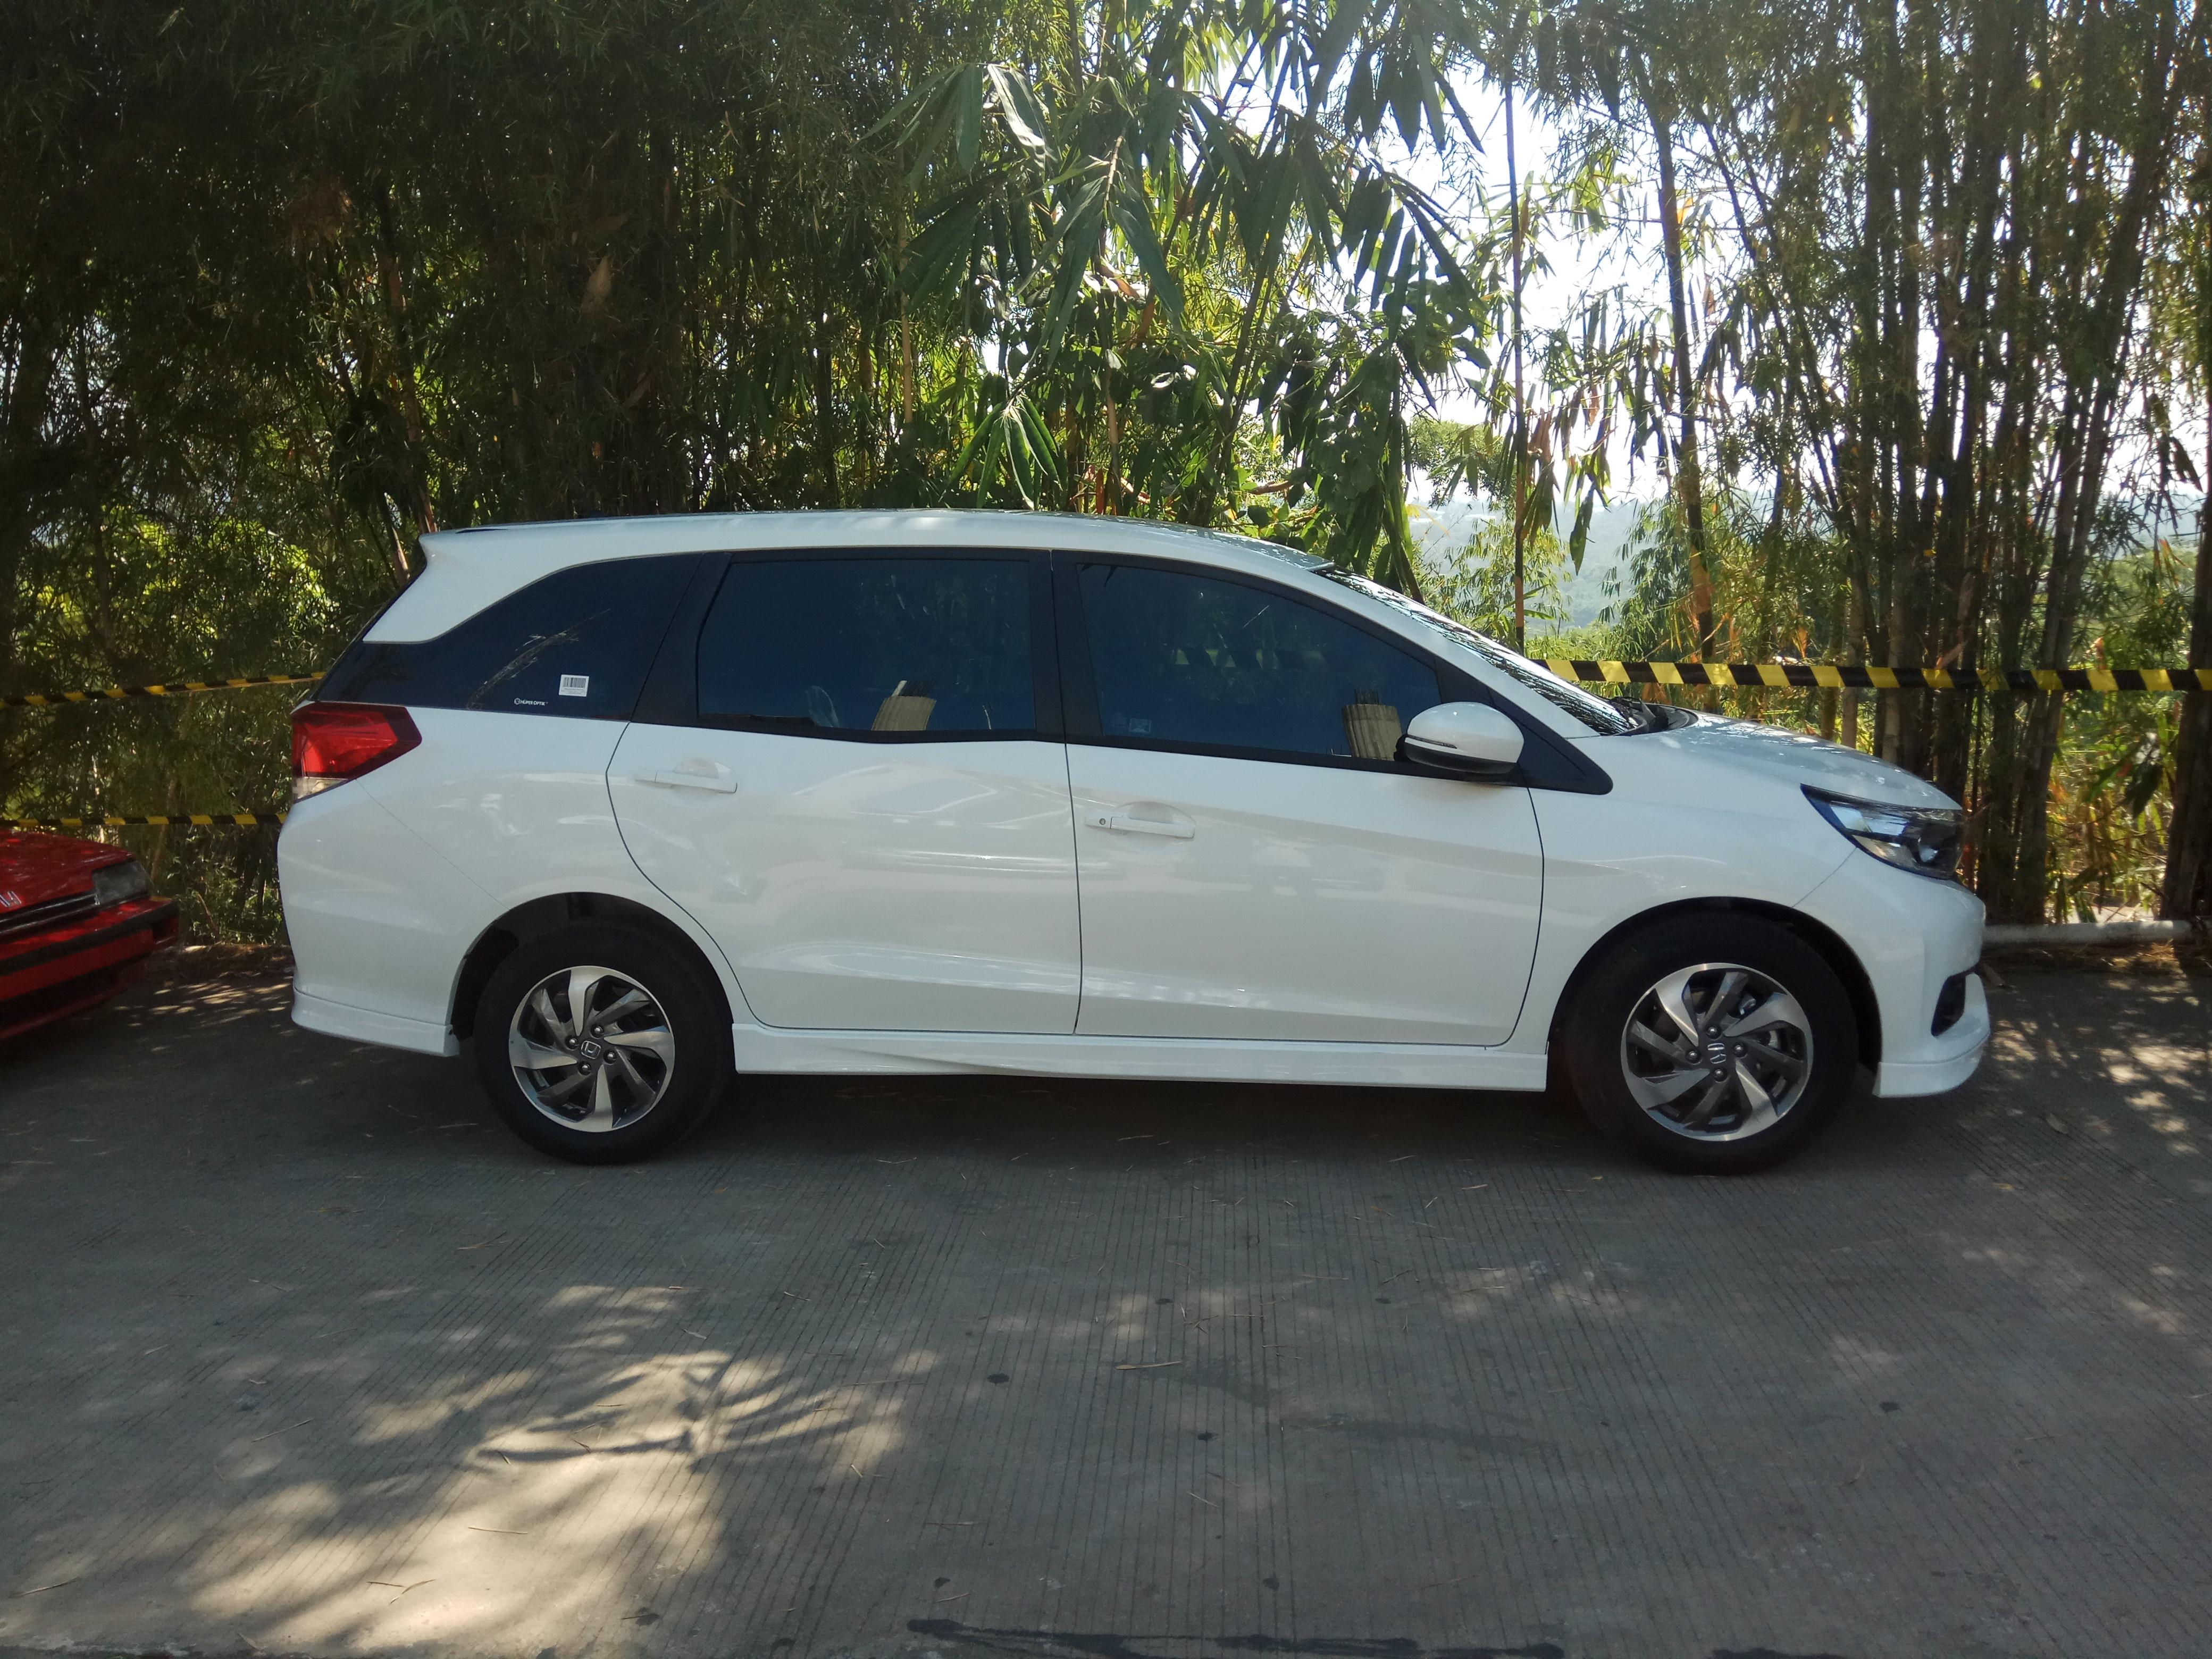 File:2019 Honda Mobilio 1.5 E (side), Bawen, Semarang.jpg ...